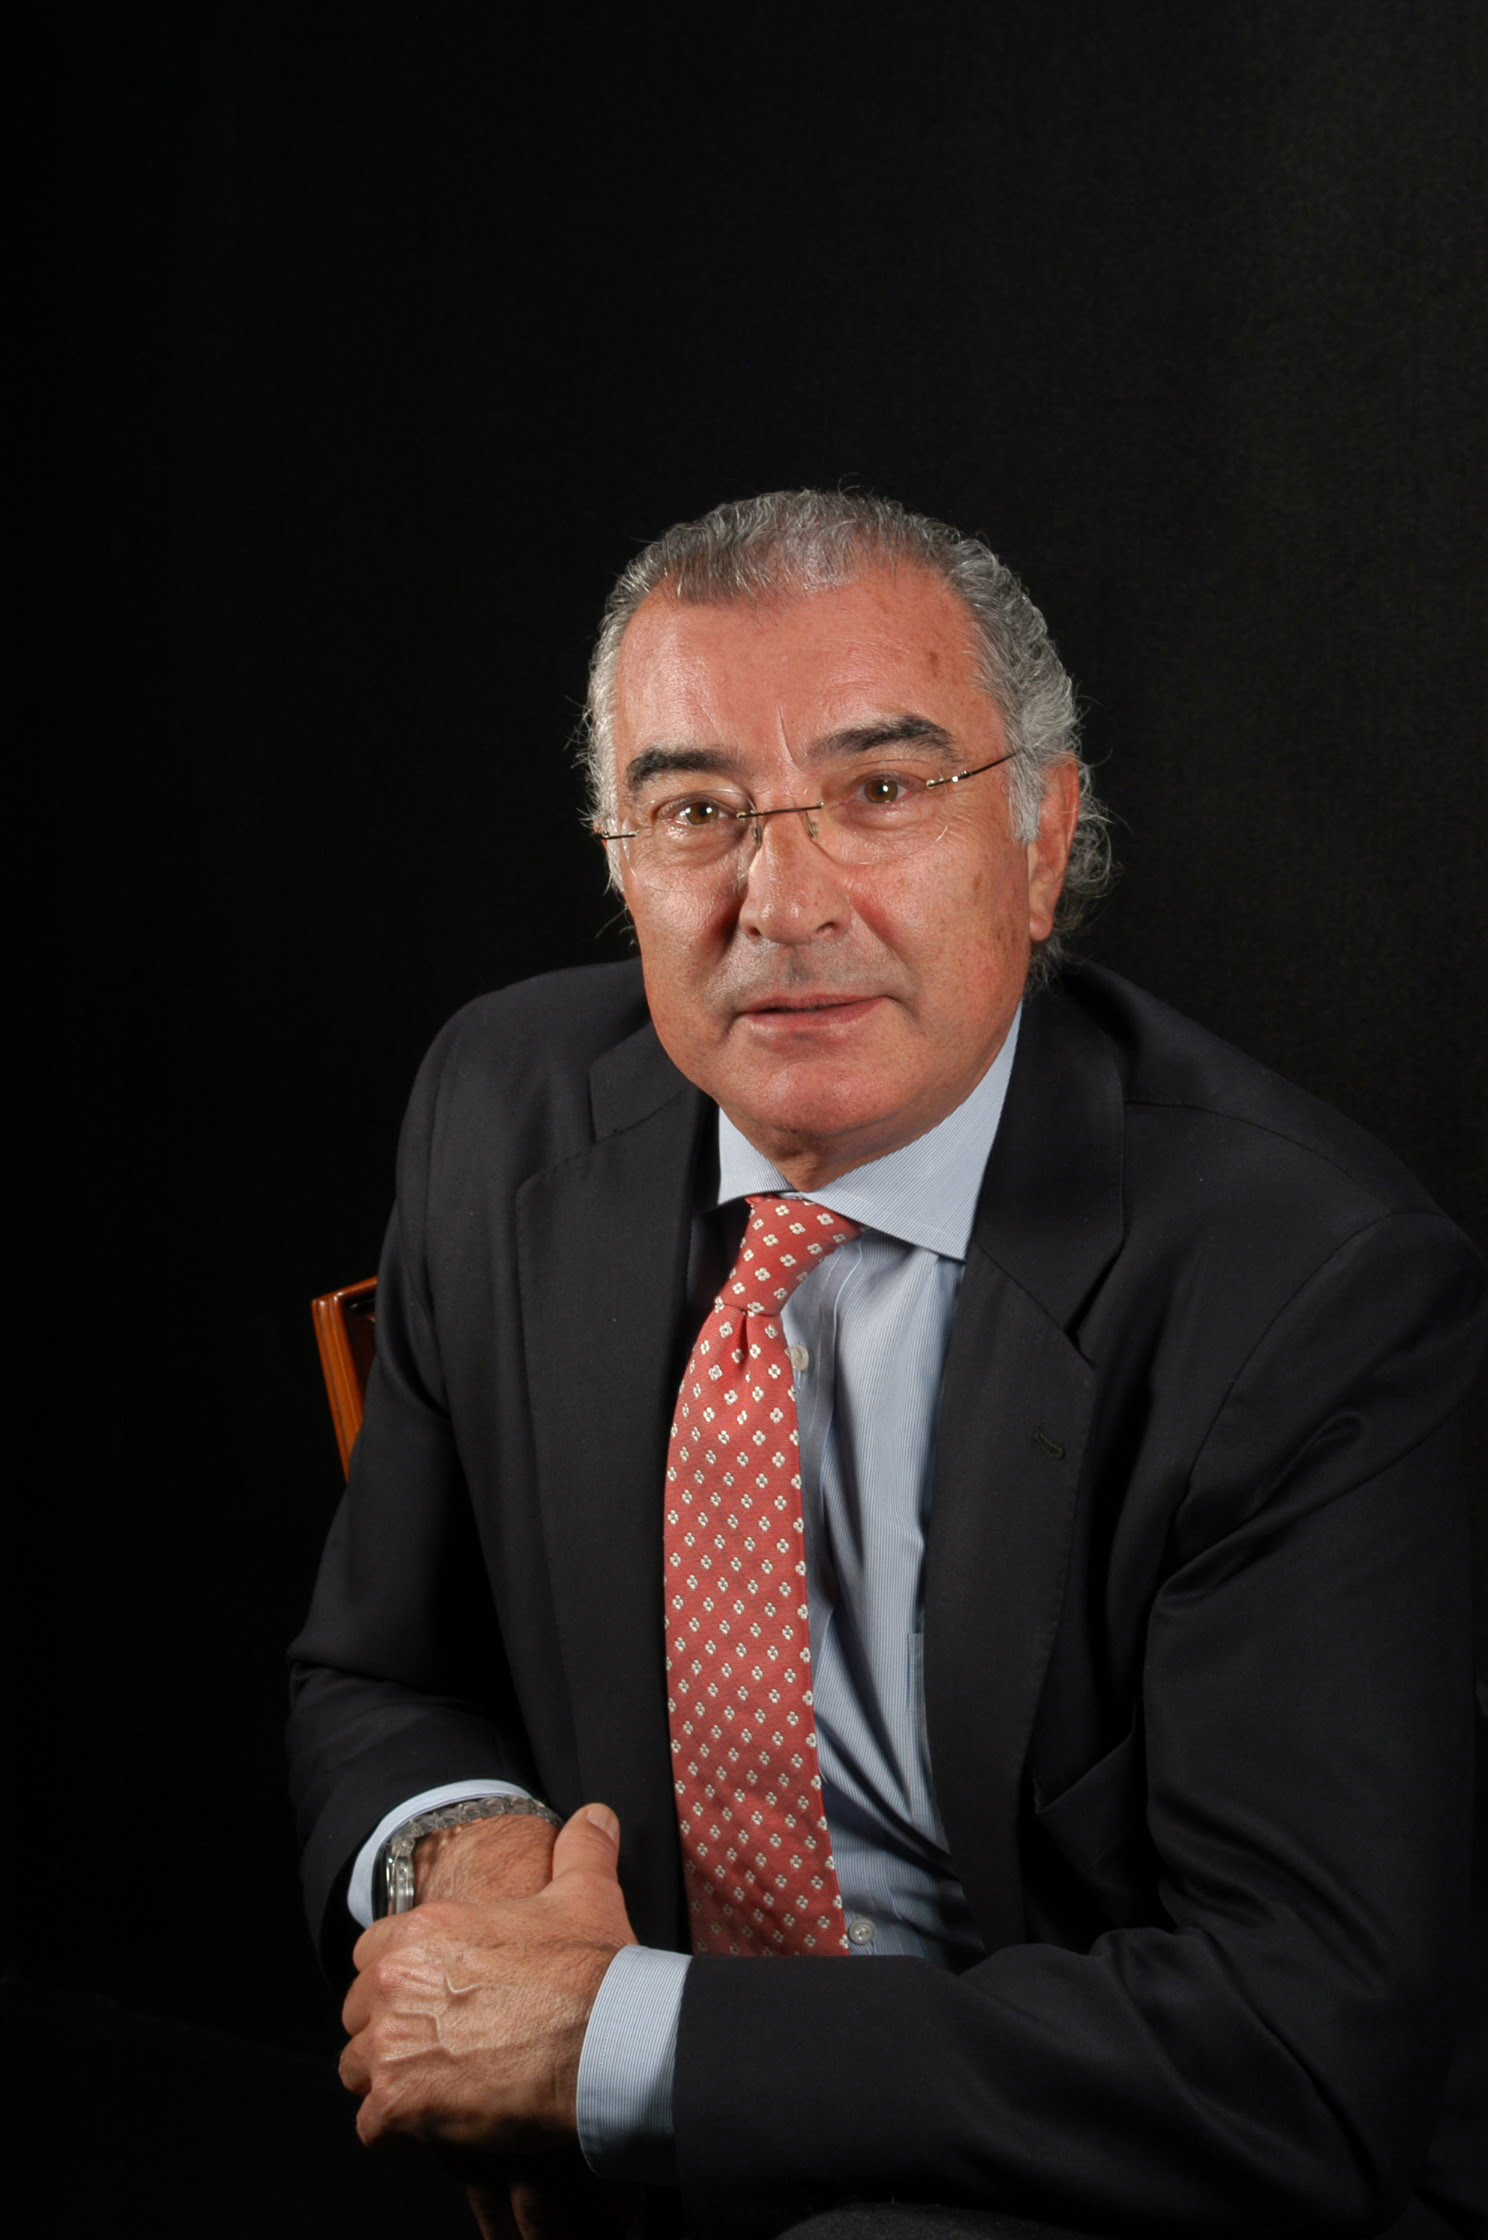 Sr. Josep Maria Blasi i Ticó